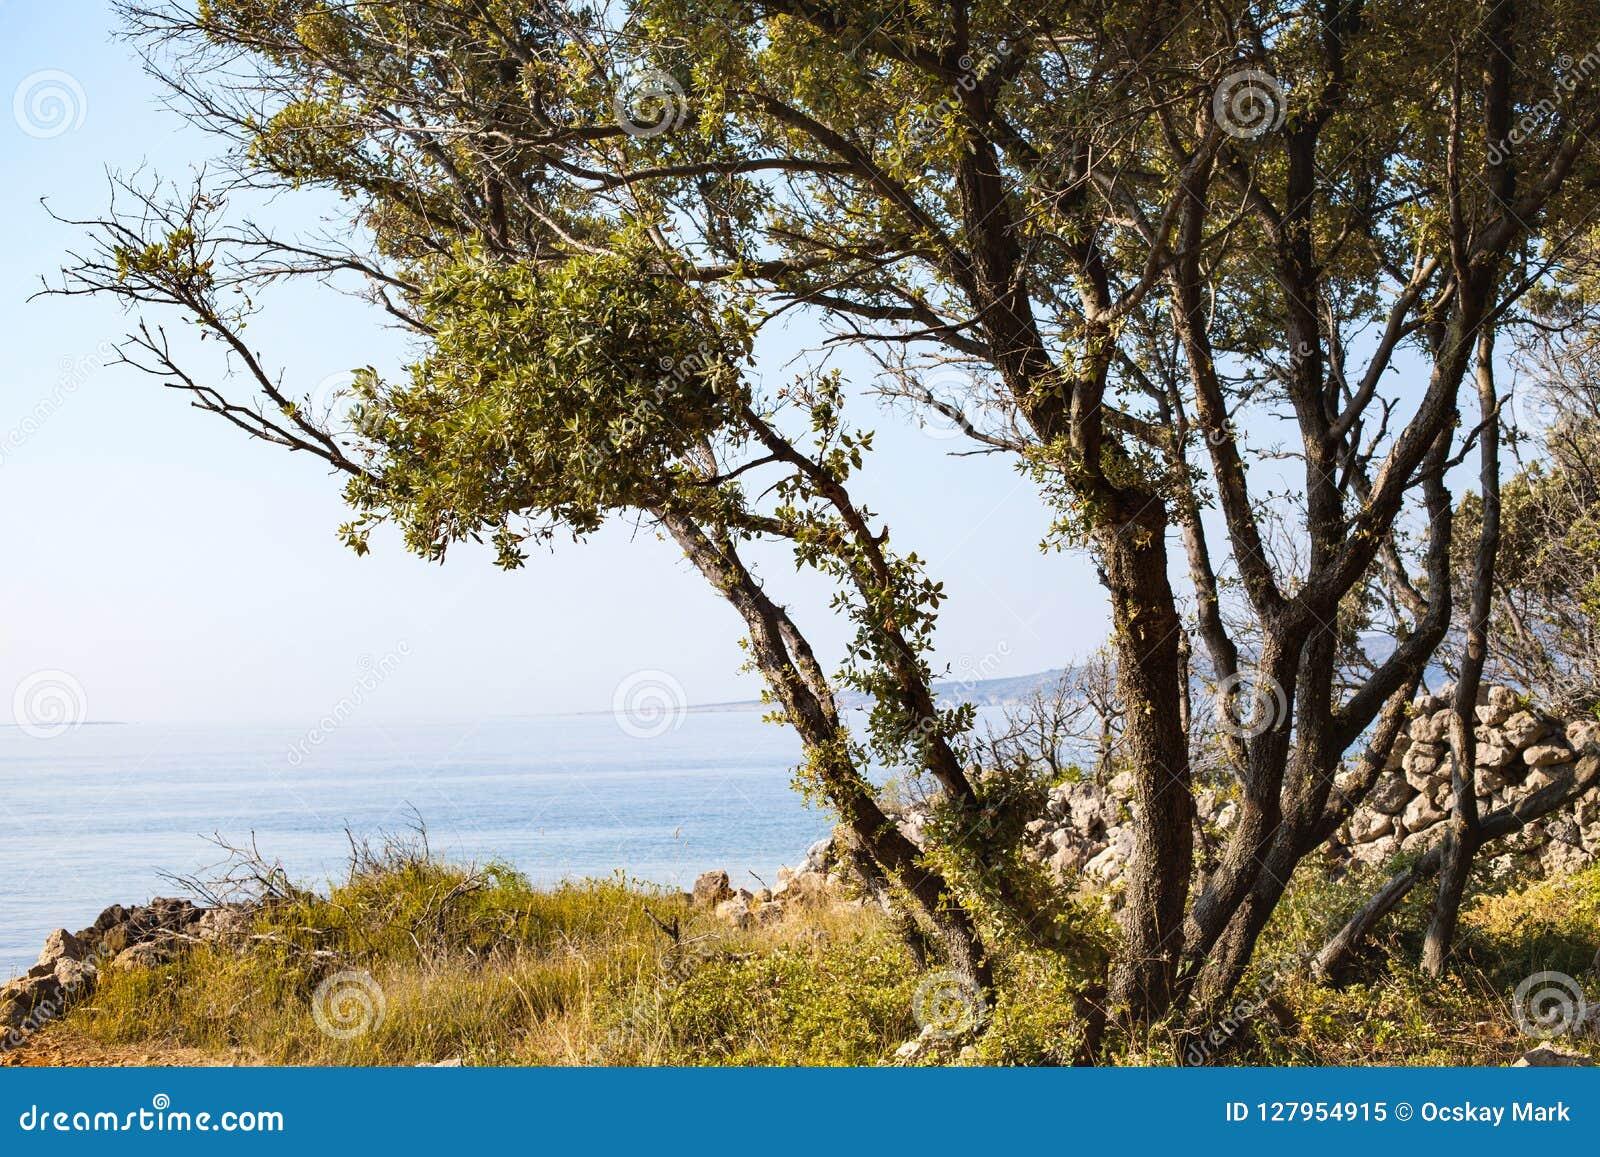 Adriatic seashore, Krk, Croatia